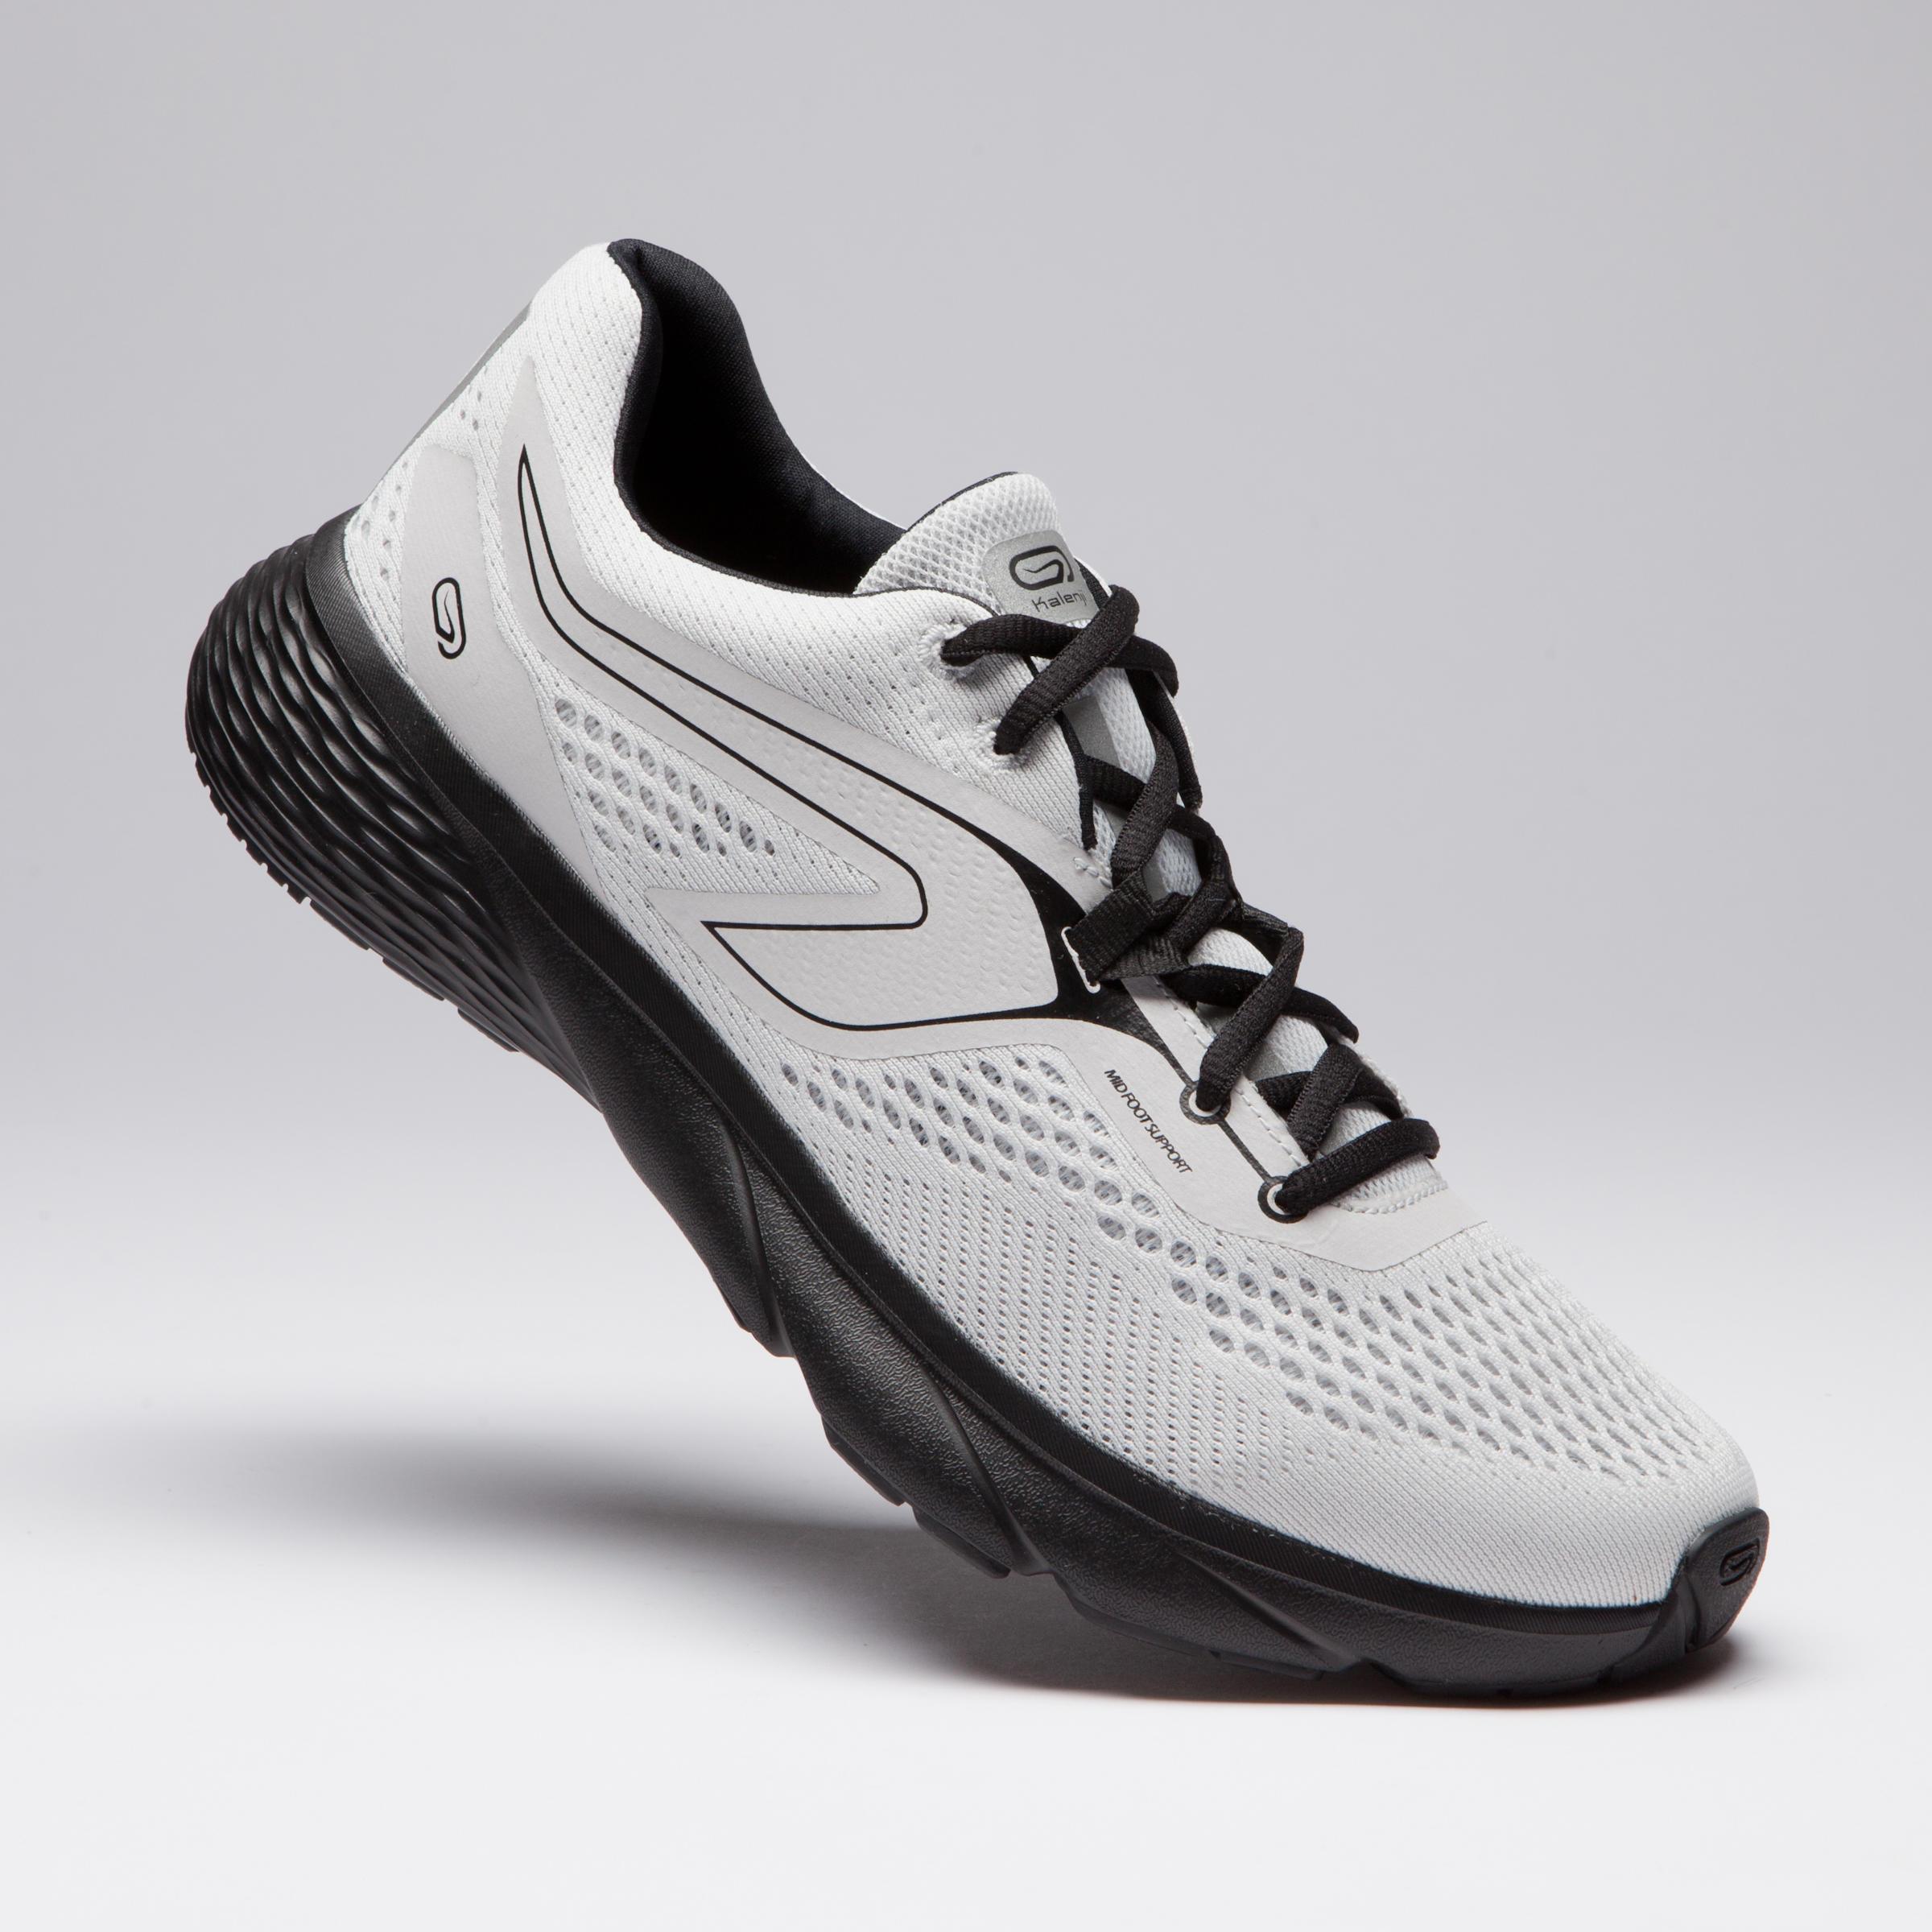 Run Support Running Shoes - Men - Decathlon